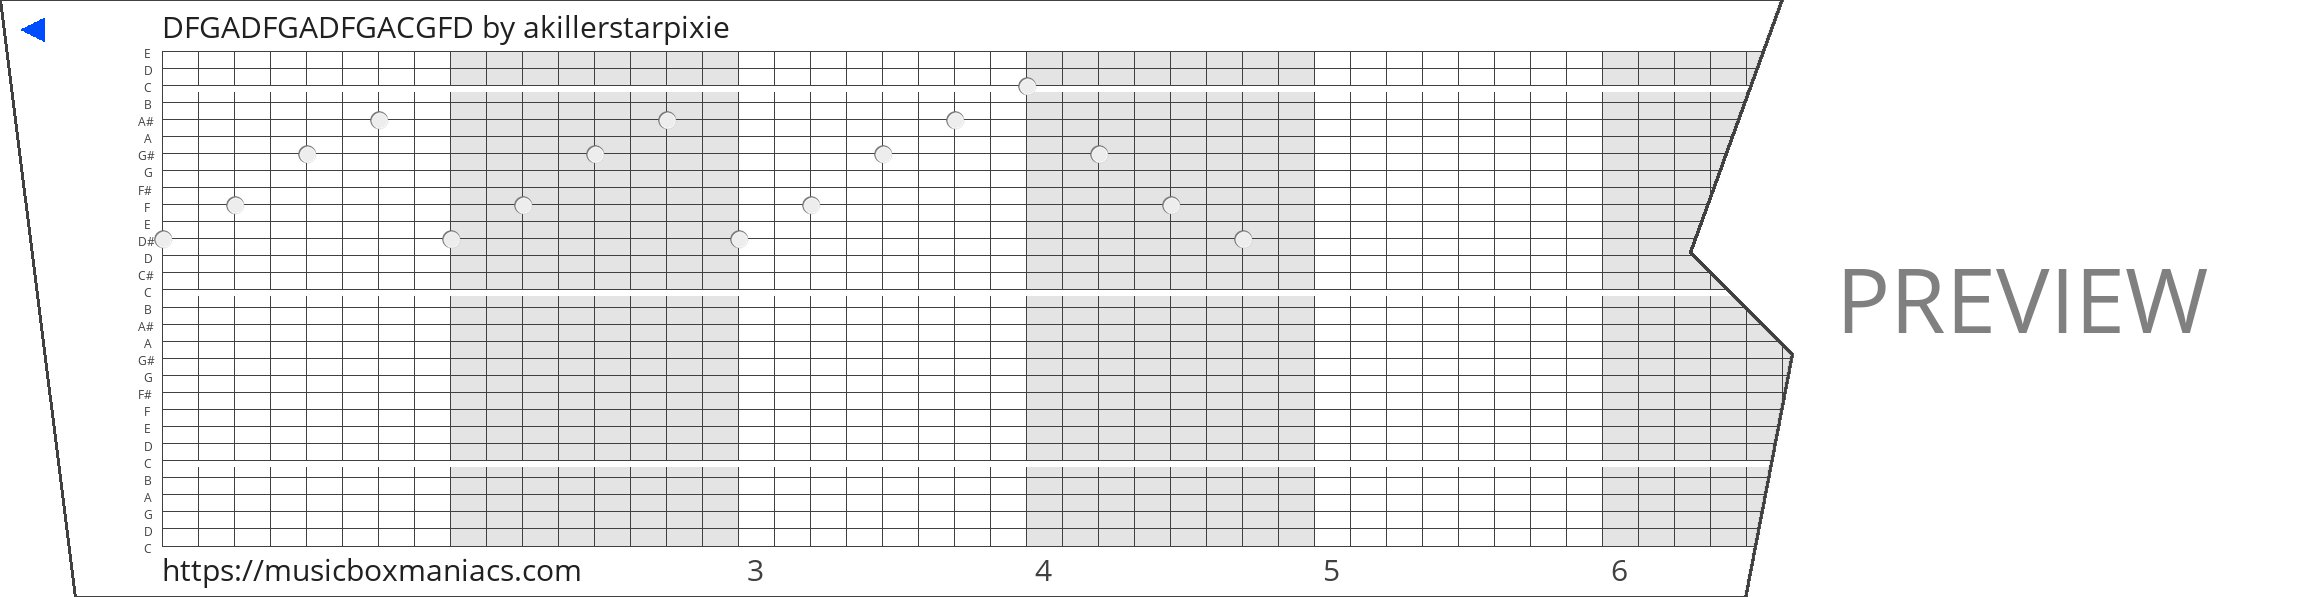 DFGADFGADFGACGFD 30 note music box paper strip